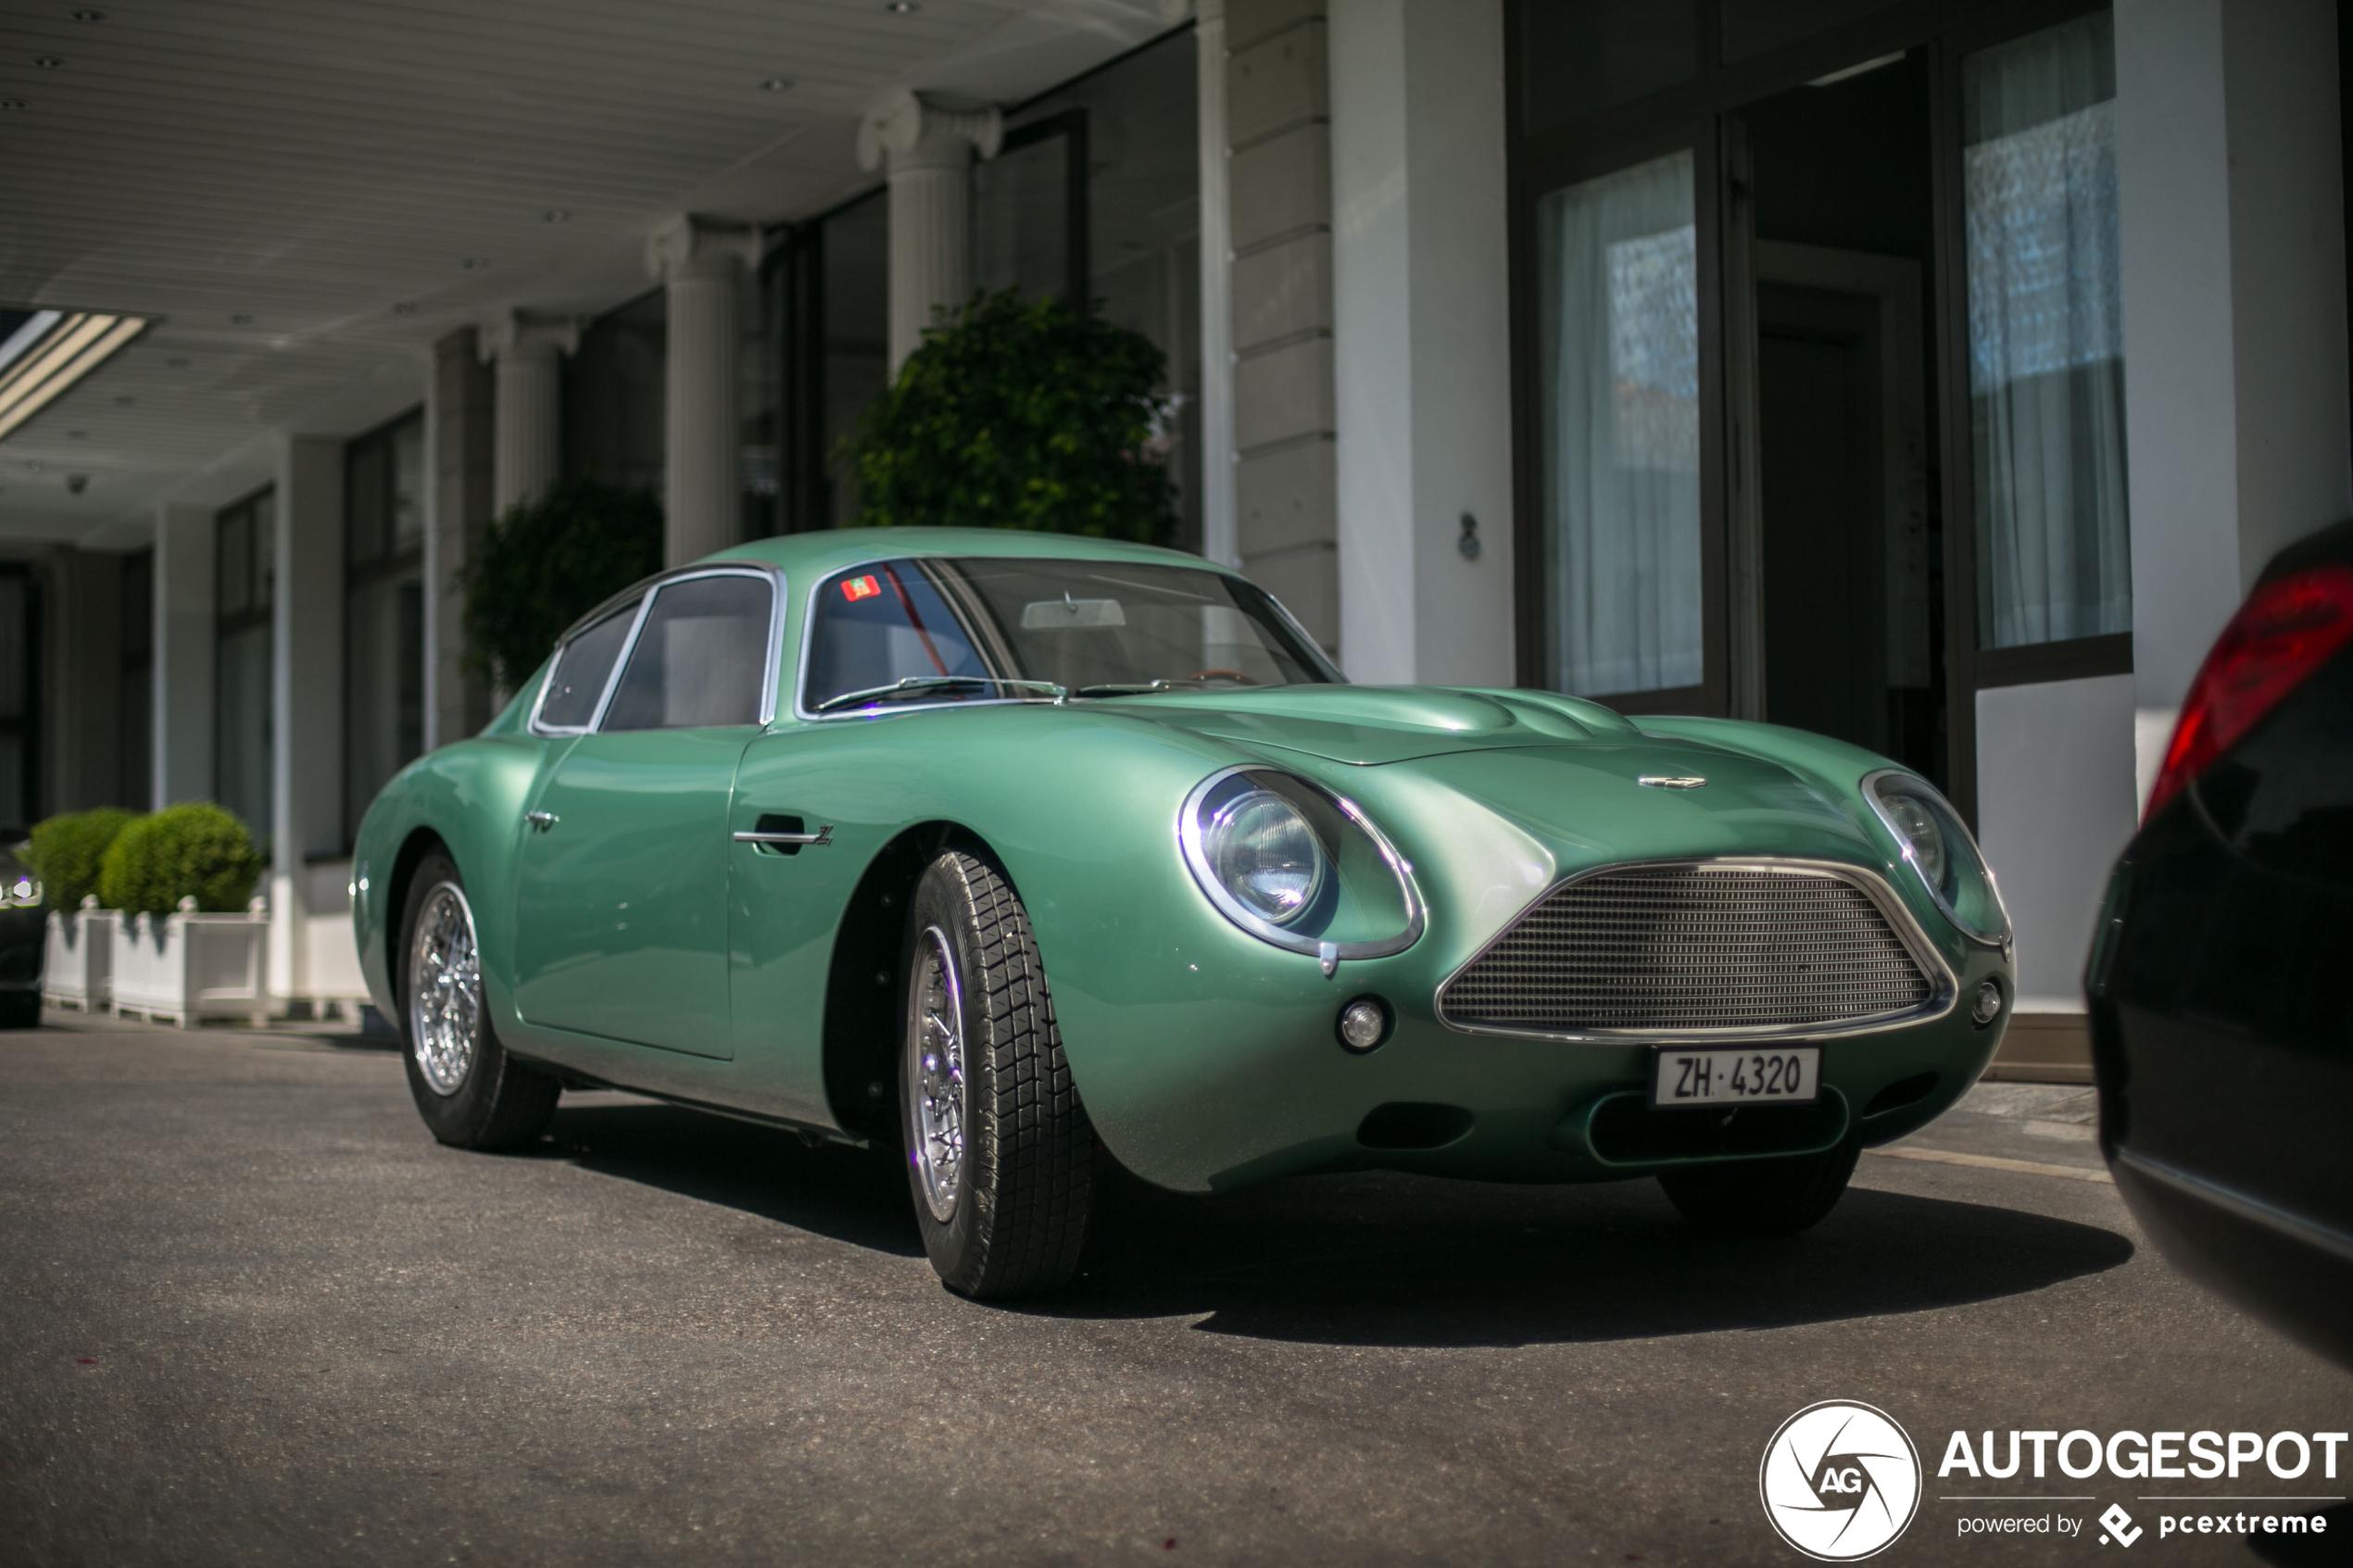 Aston Martin Db4 Gt Zagato 11 Juli 2020 Autogespot